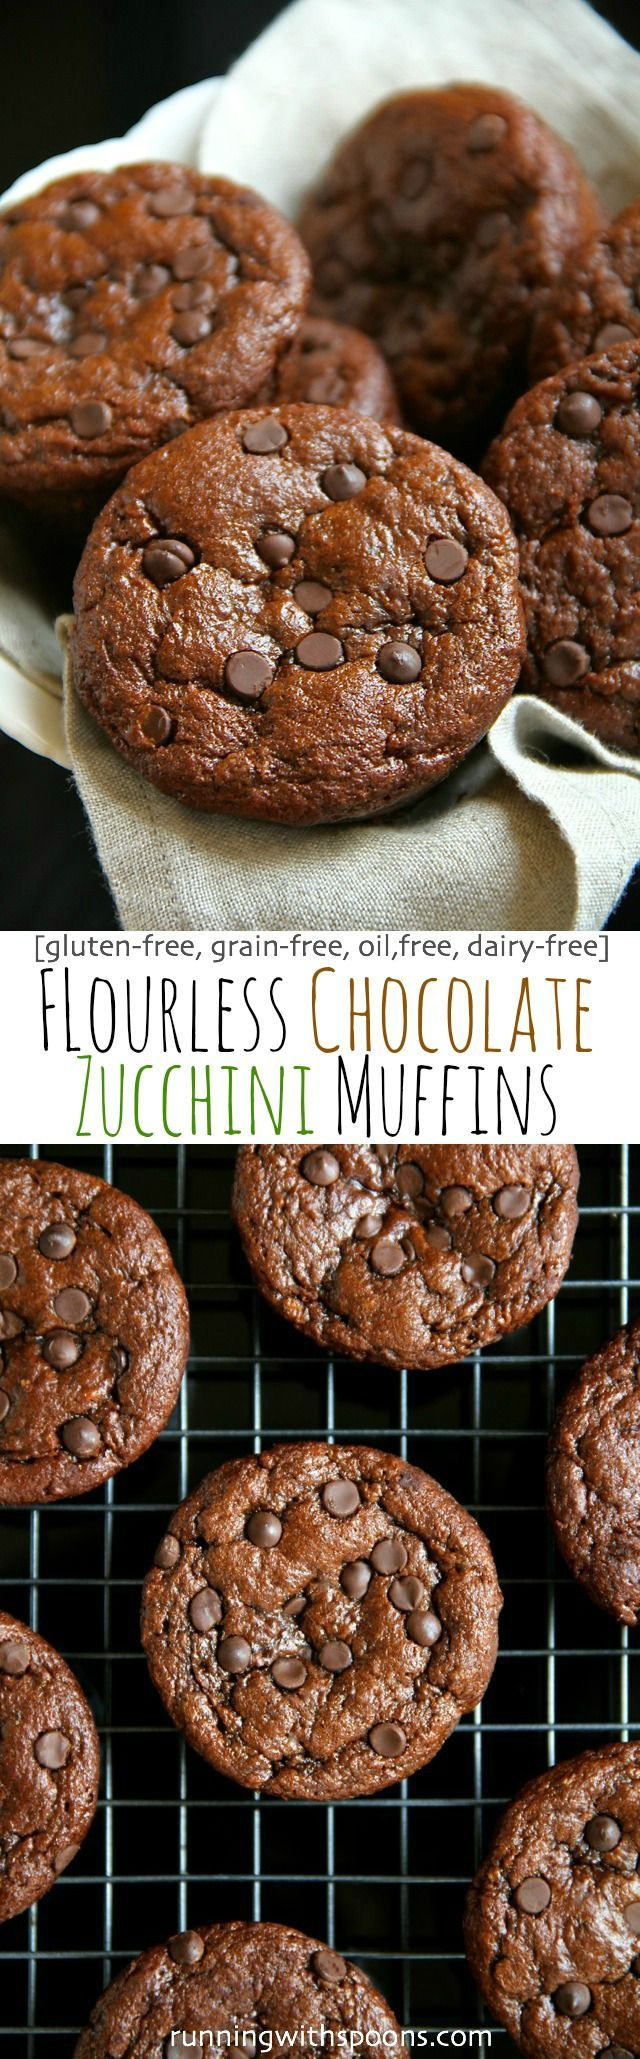 Flourless Chocolate Zucchini Muffins - Gluten free, grain free, oil free, dairy free, refined sugar free.